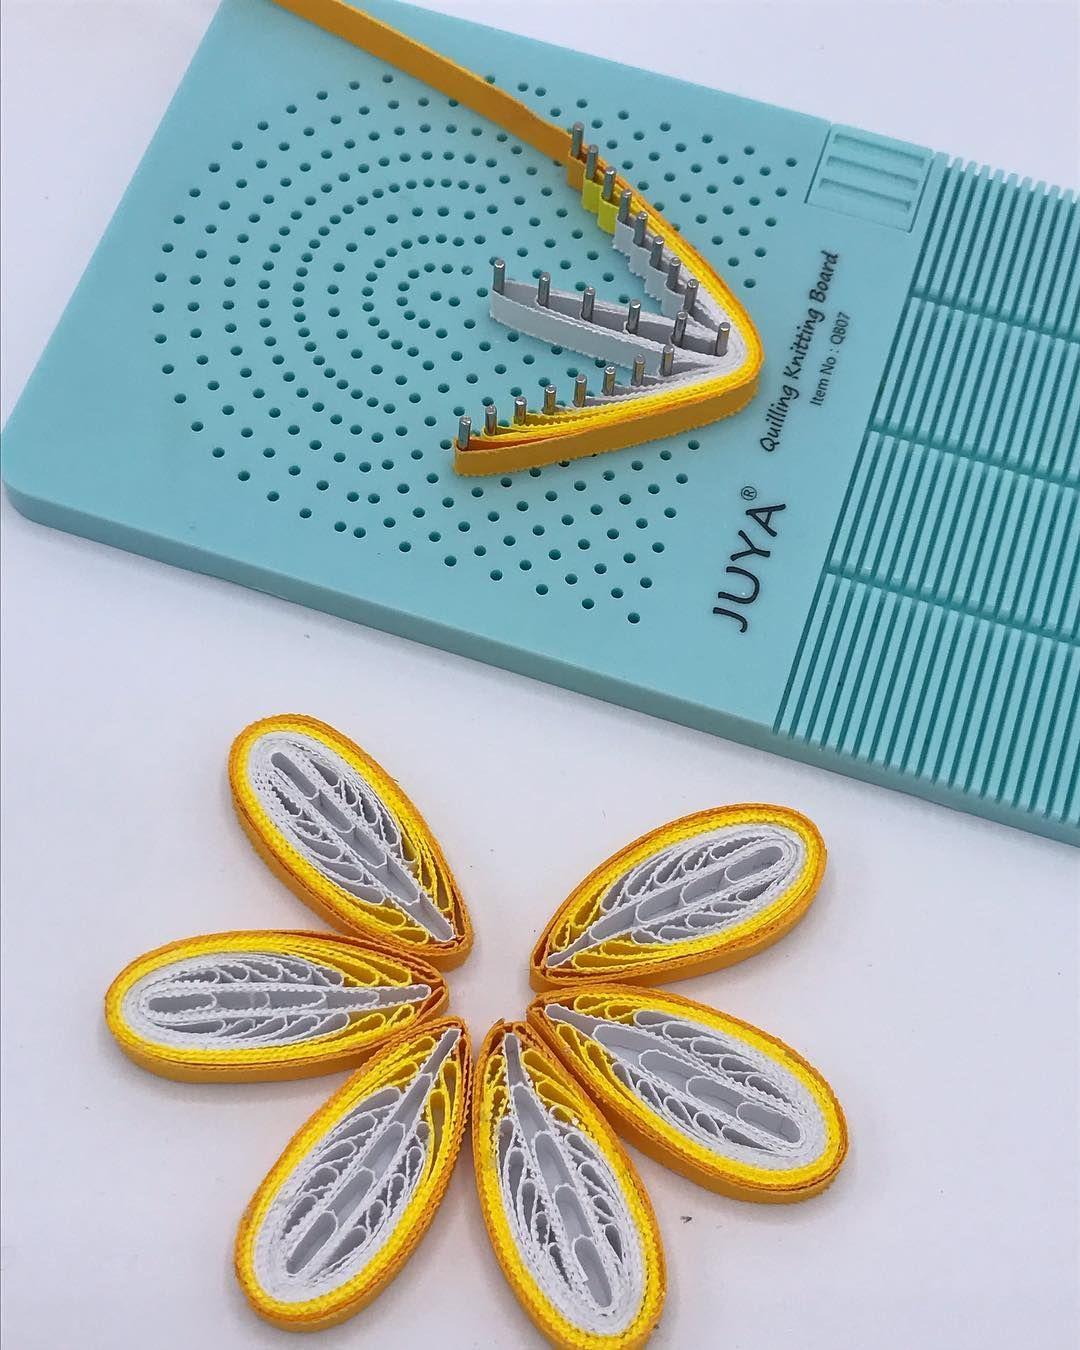 Quilling Kwiaty Quilled Flowers Bukiet Quilling Pinterest Quilling Paper Quilling And Quilling Work Quilling Designs Paper Quilling Designs